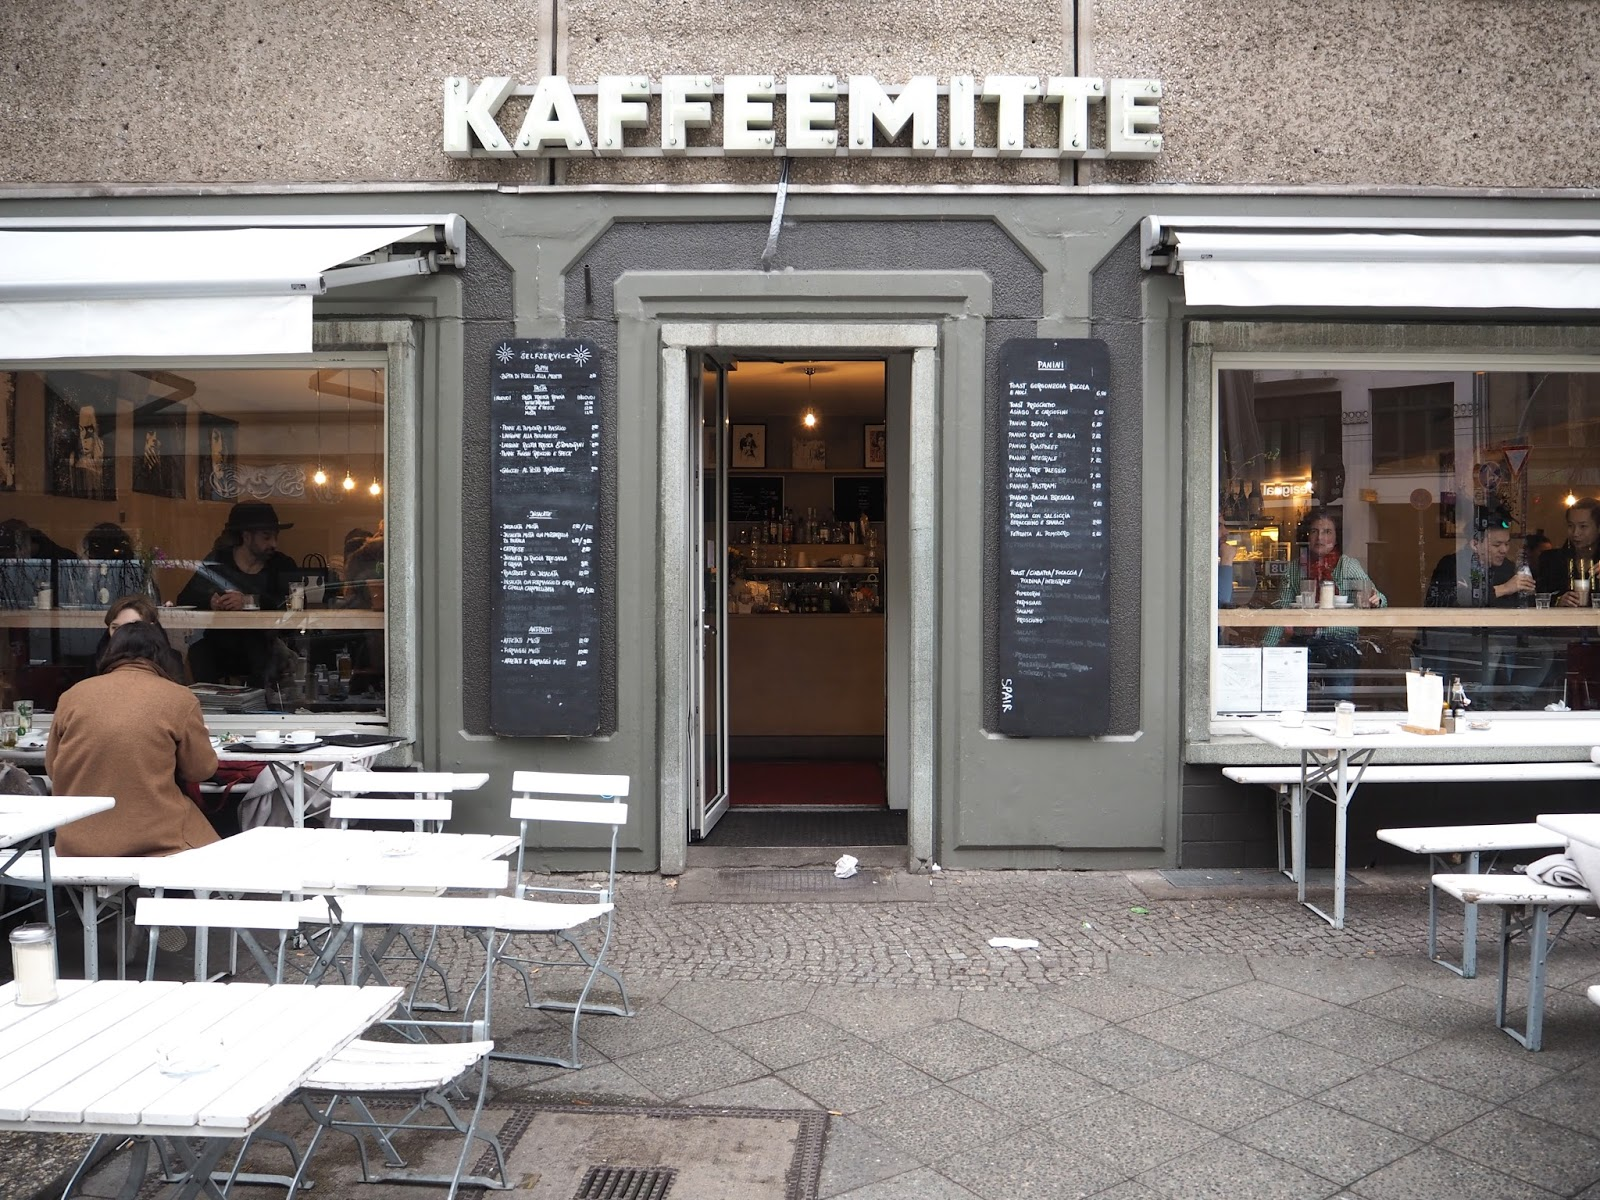 Cake at Kaffeemitte cafe in Berlin